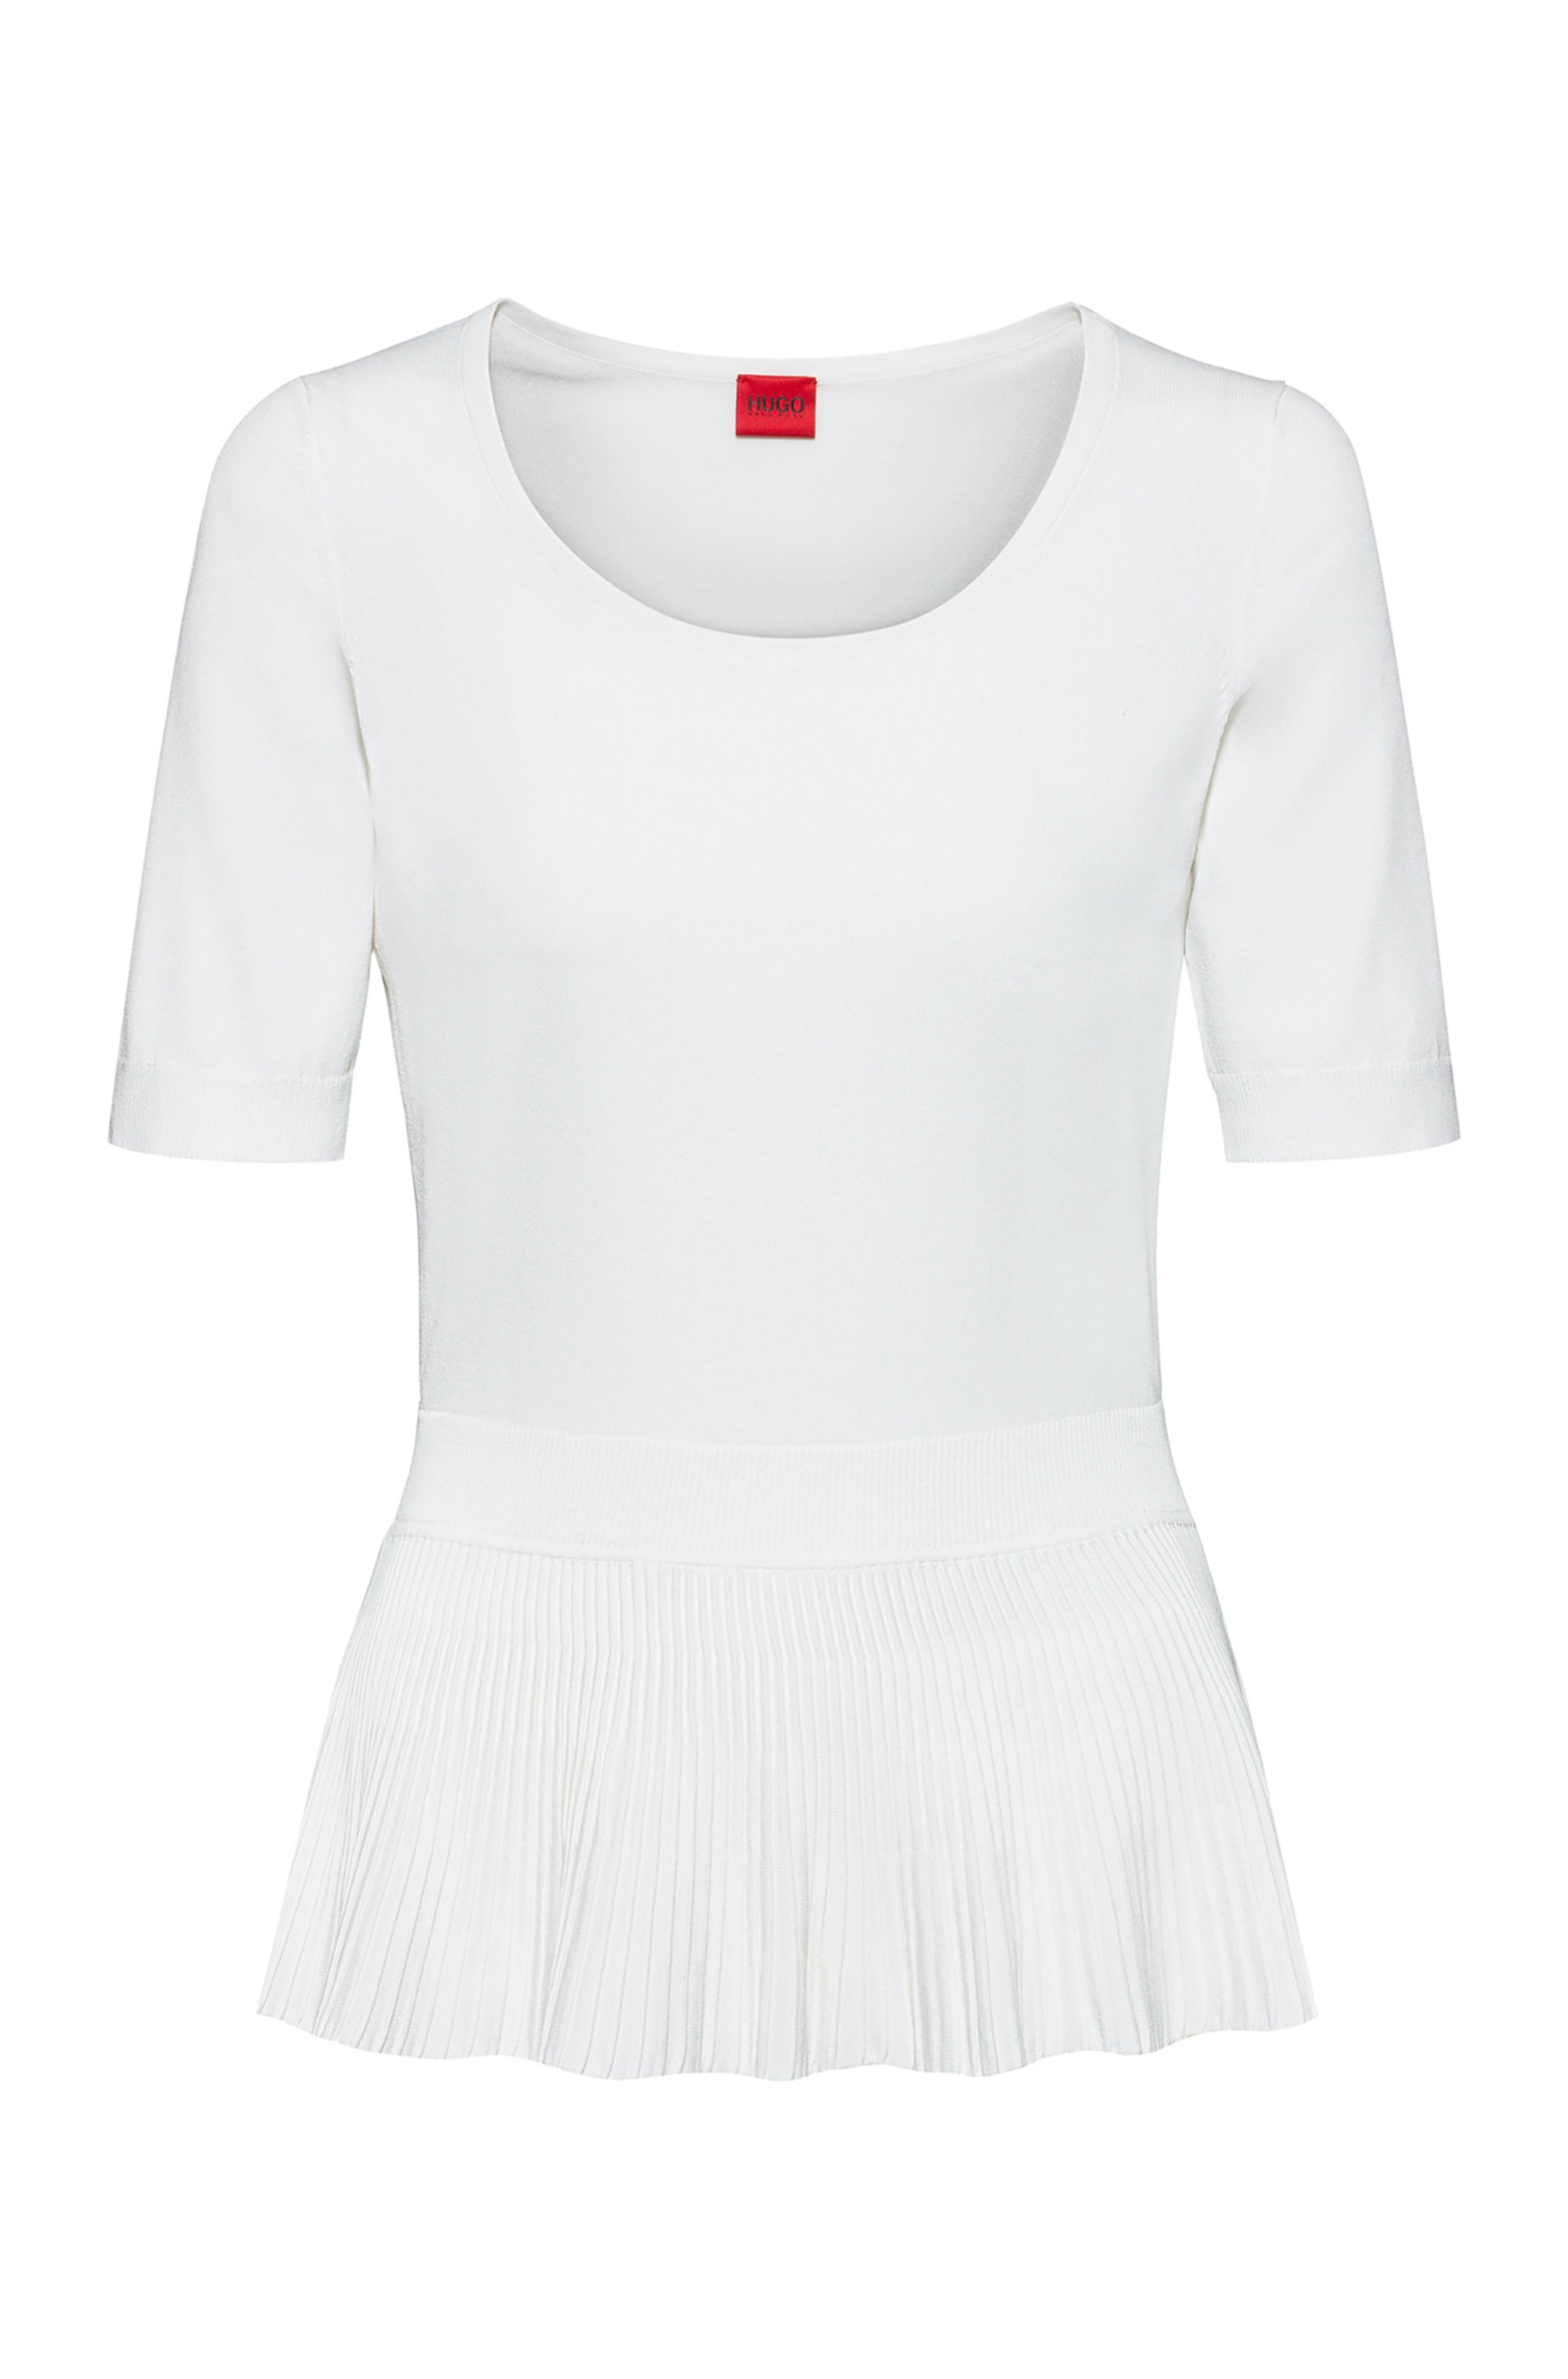 Short-sleeved sweater in stretch fabric with peplum hem, White